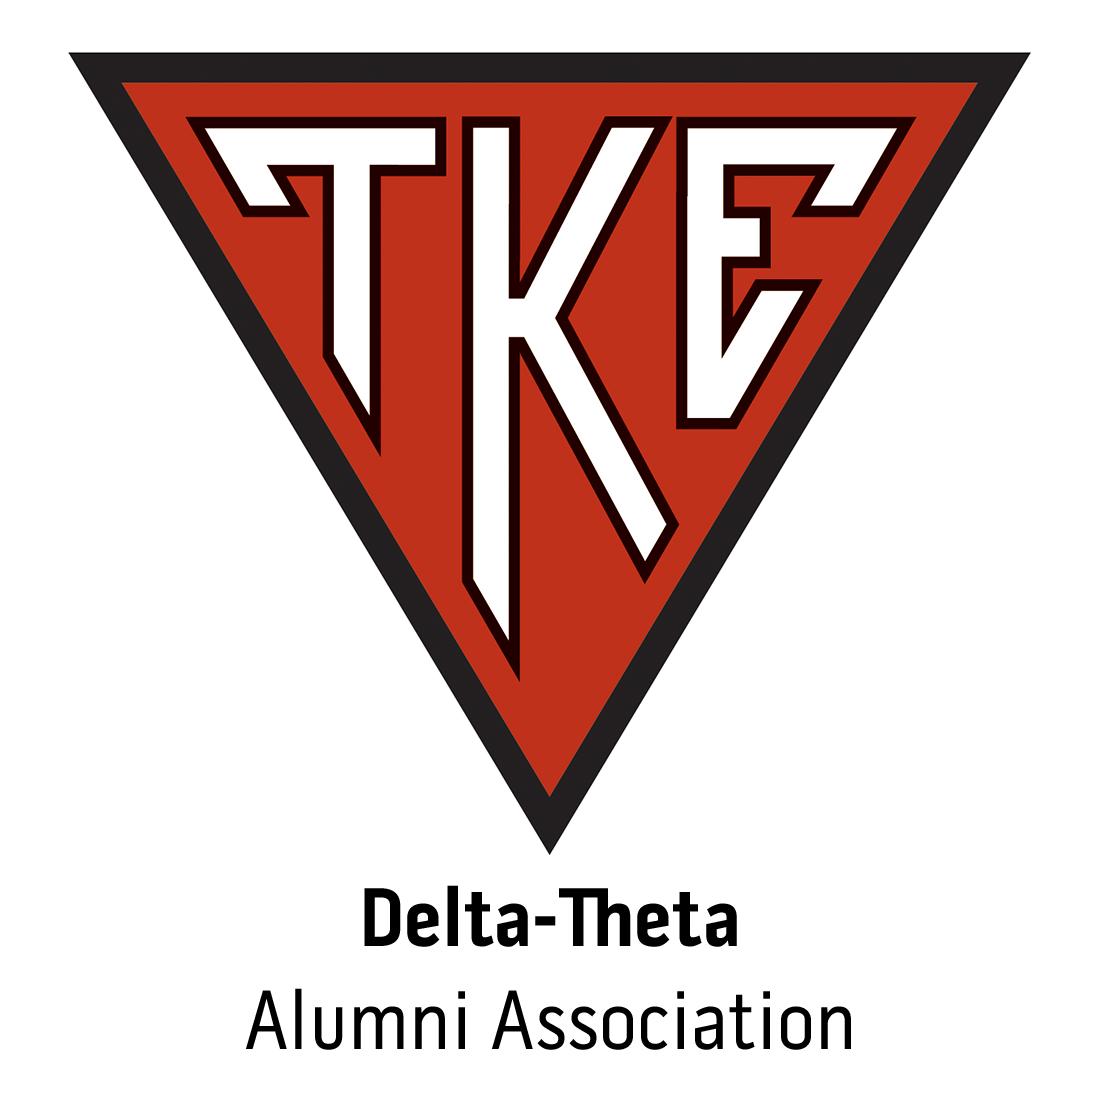 Delta-Theta Alumni Association at California State University, Long Beach